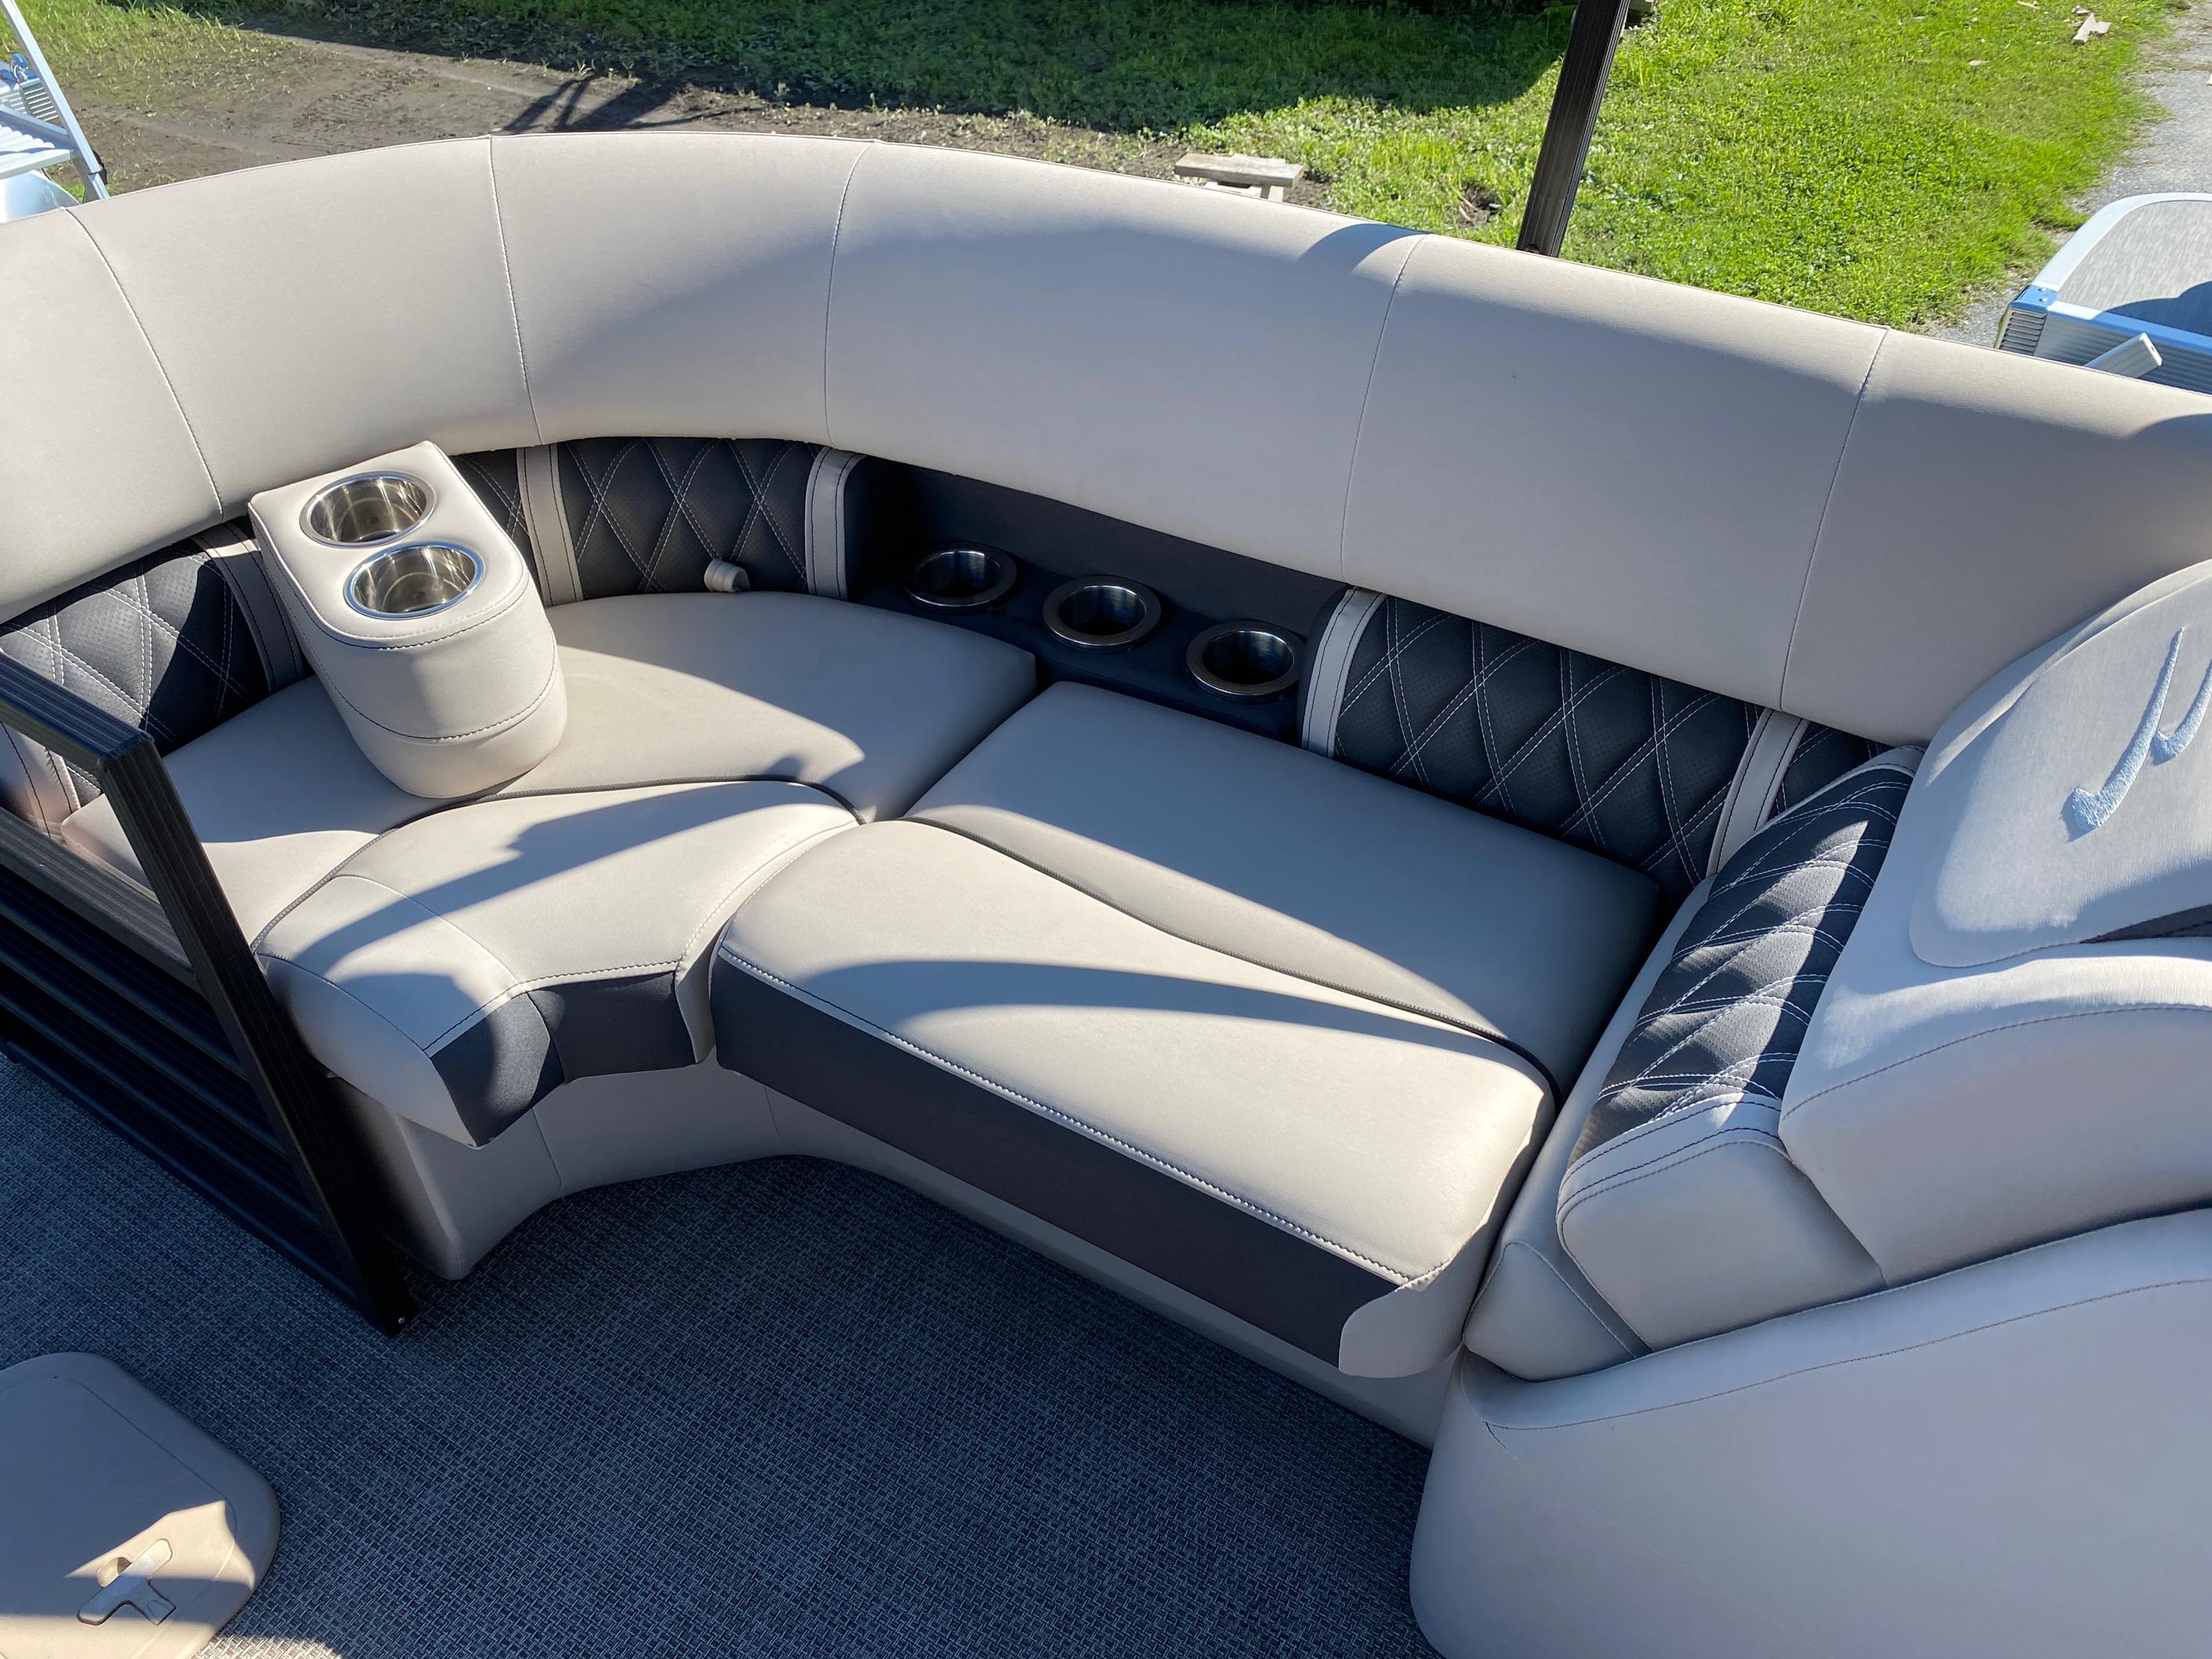 2019 Bennington boat for sale, model of the boat is 23 GSR & Image # 9 of 10